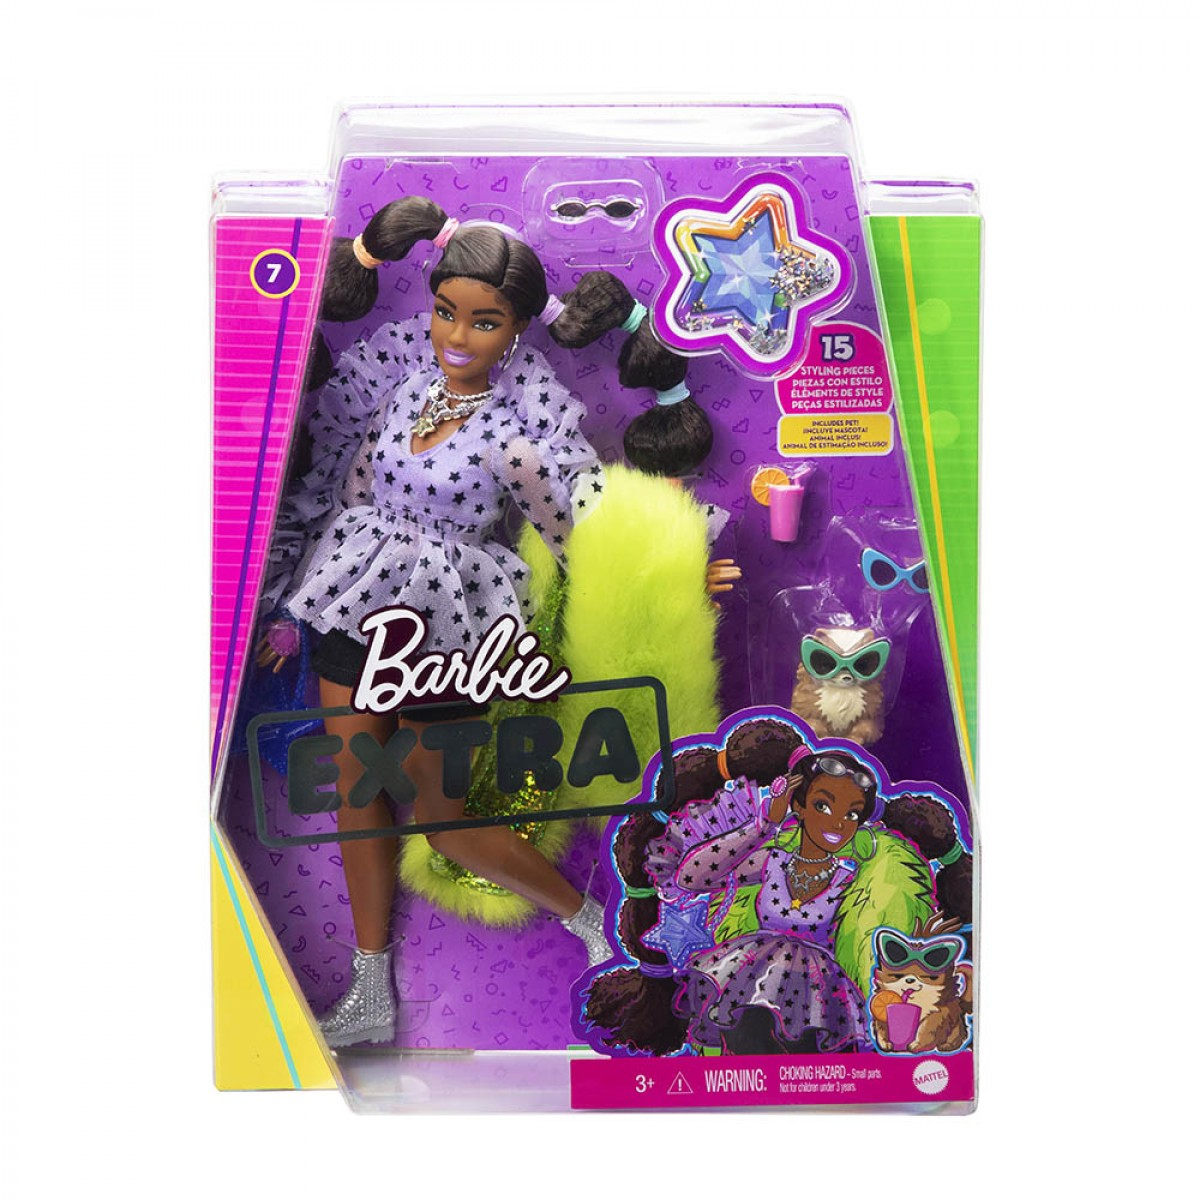 BARBIE EXTRA BOBBLE HAIR GXF10